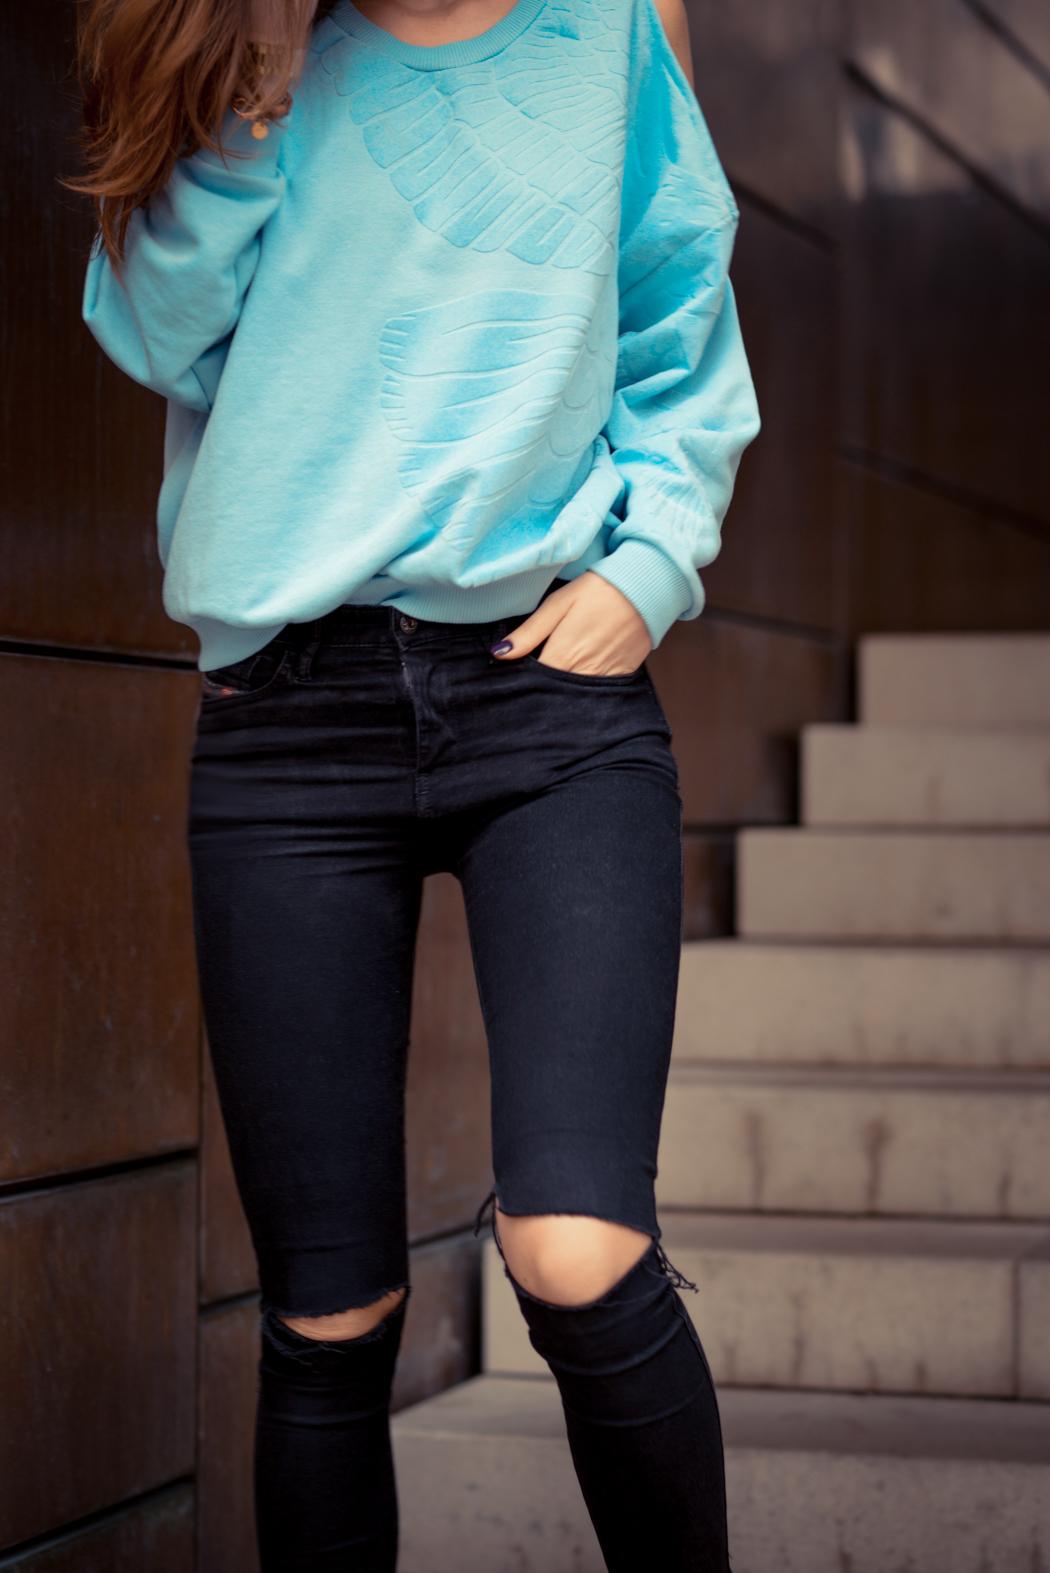 Rita-Ora-Sweatshirt-hellblau-Fashionblogger-München-1